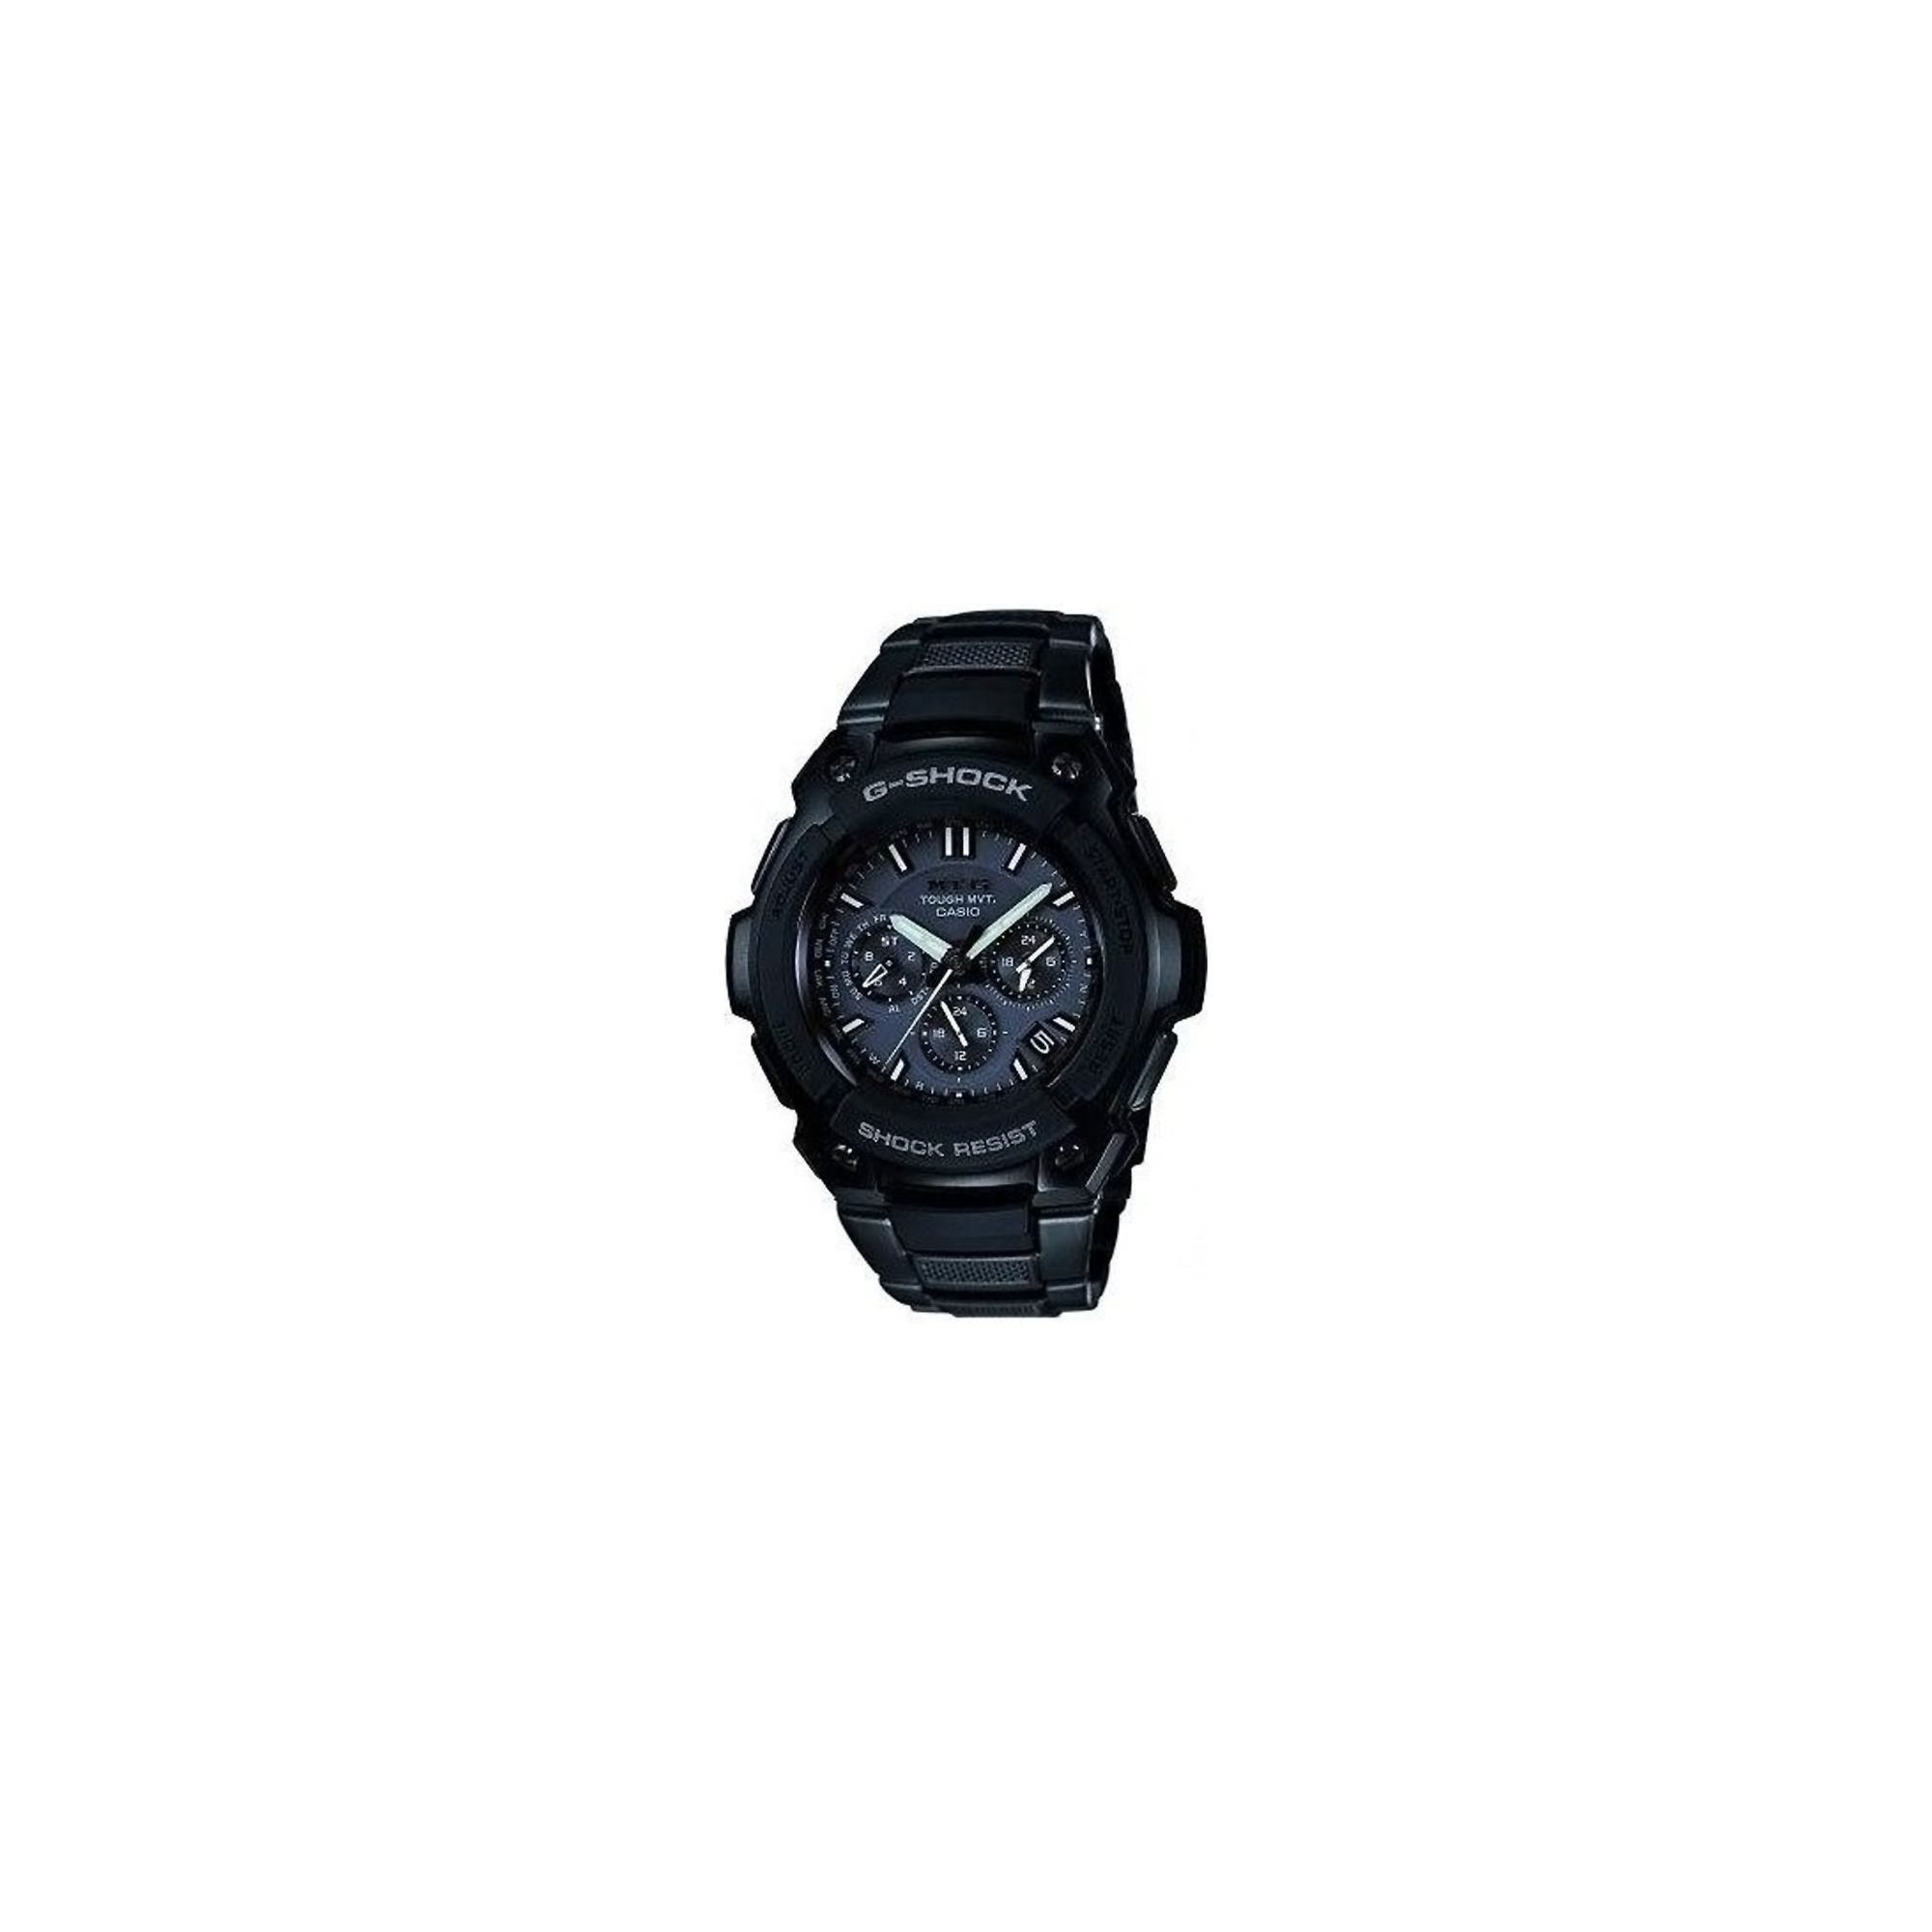 Casio G-Shock MT-G Premium Chronograph Watch MTG-1200B-1AER at Tesco Direct